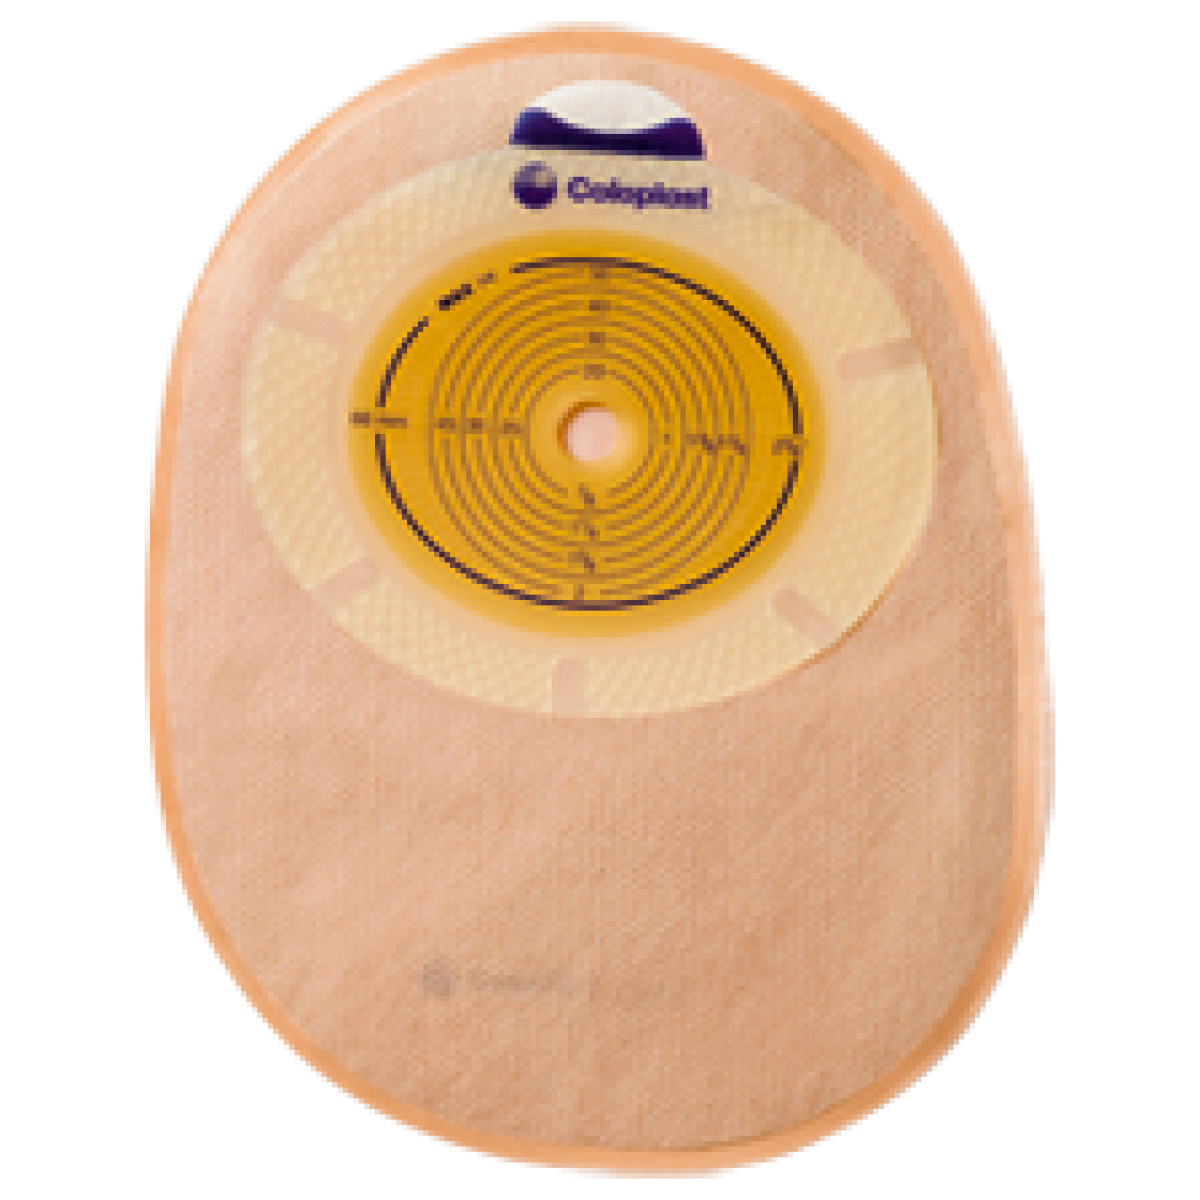 Bolsa 10-76mm Fechada Opaca Sensura 15480 - (Coloplast)